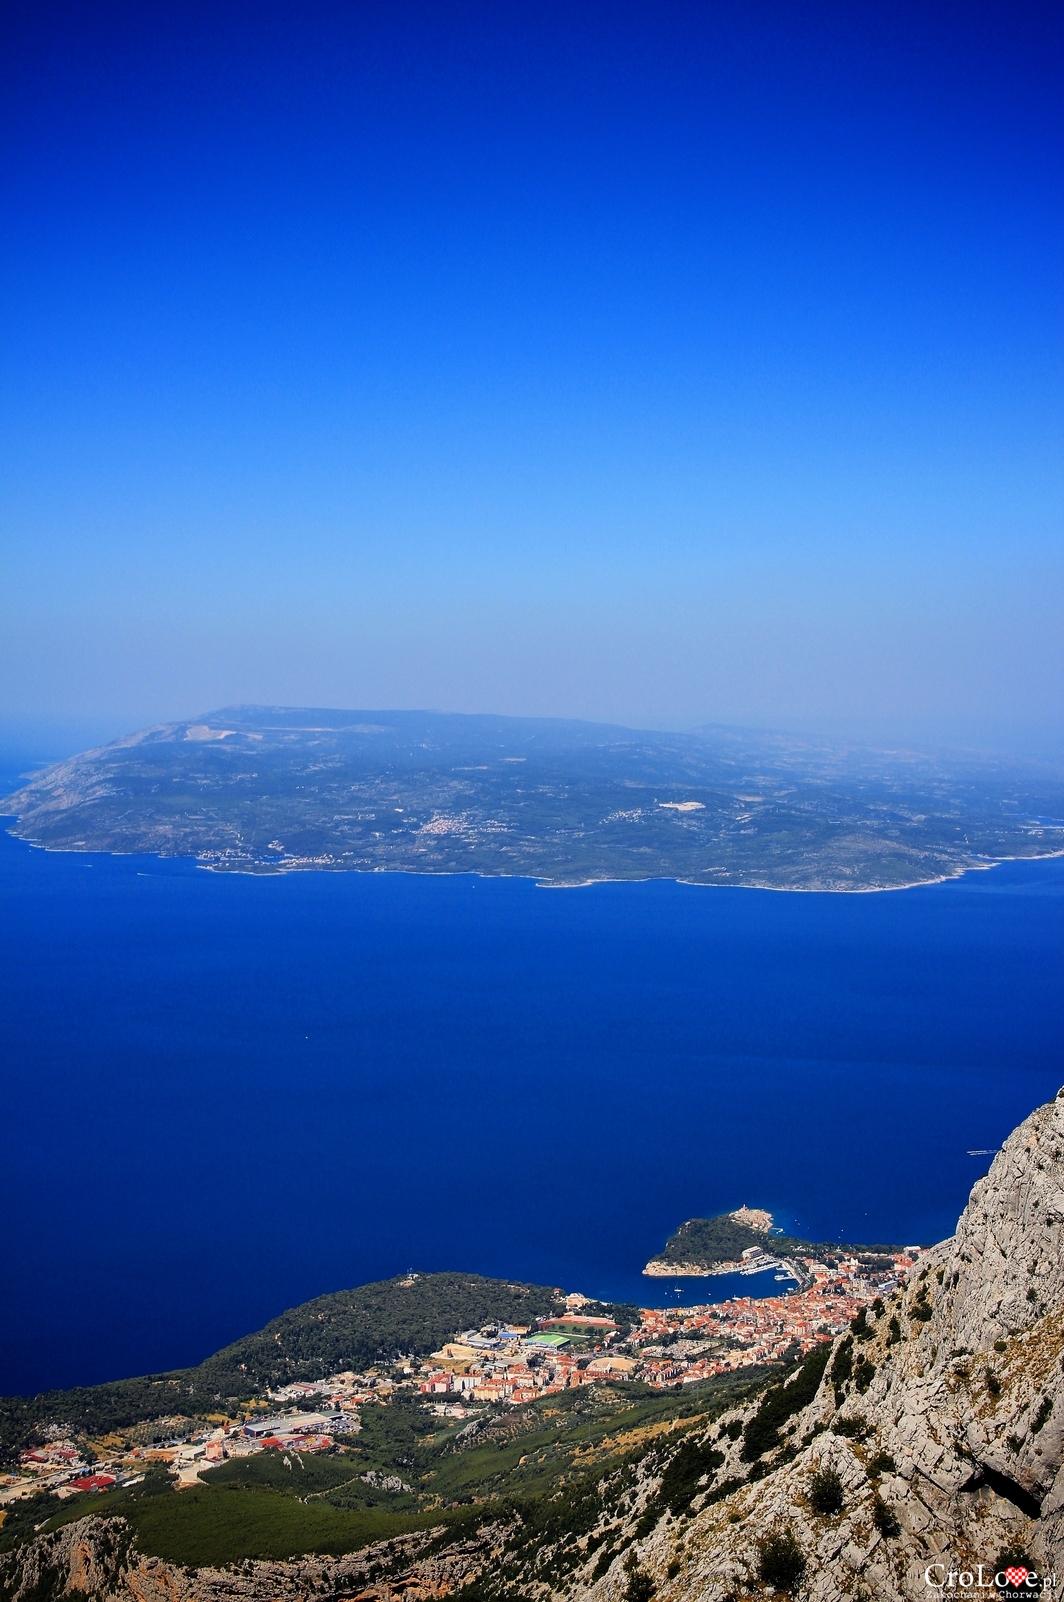 Widok na wyspę Brač i Makarską z masywu Biokovo